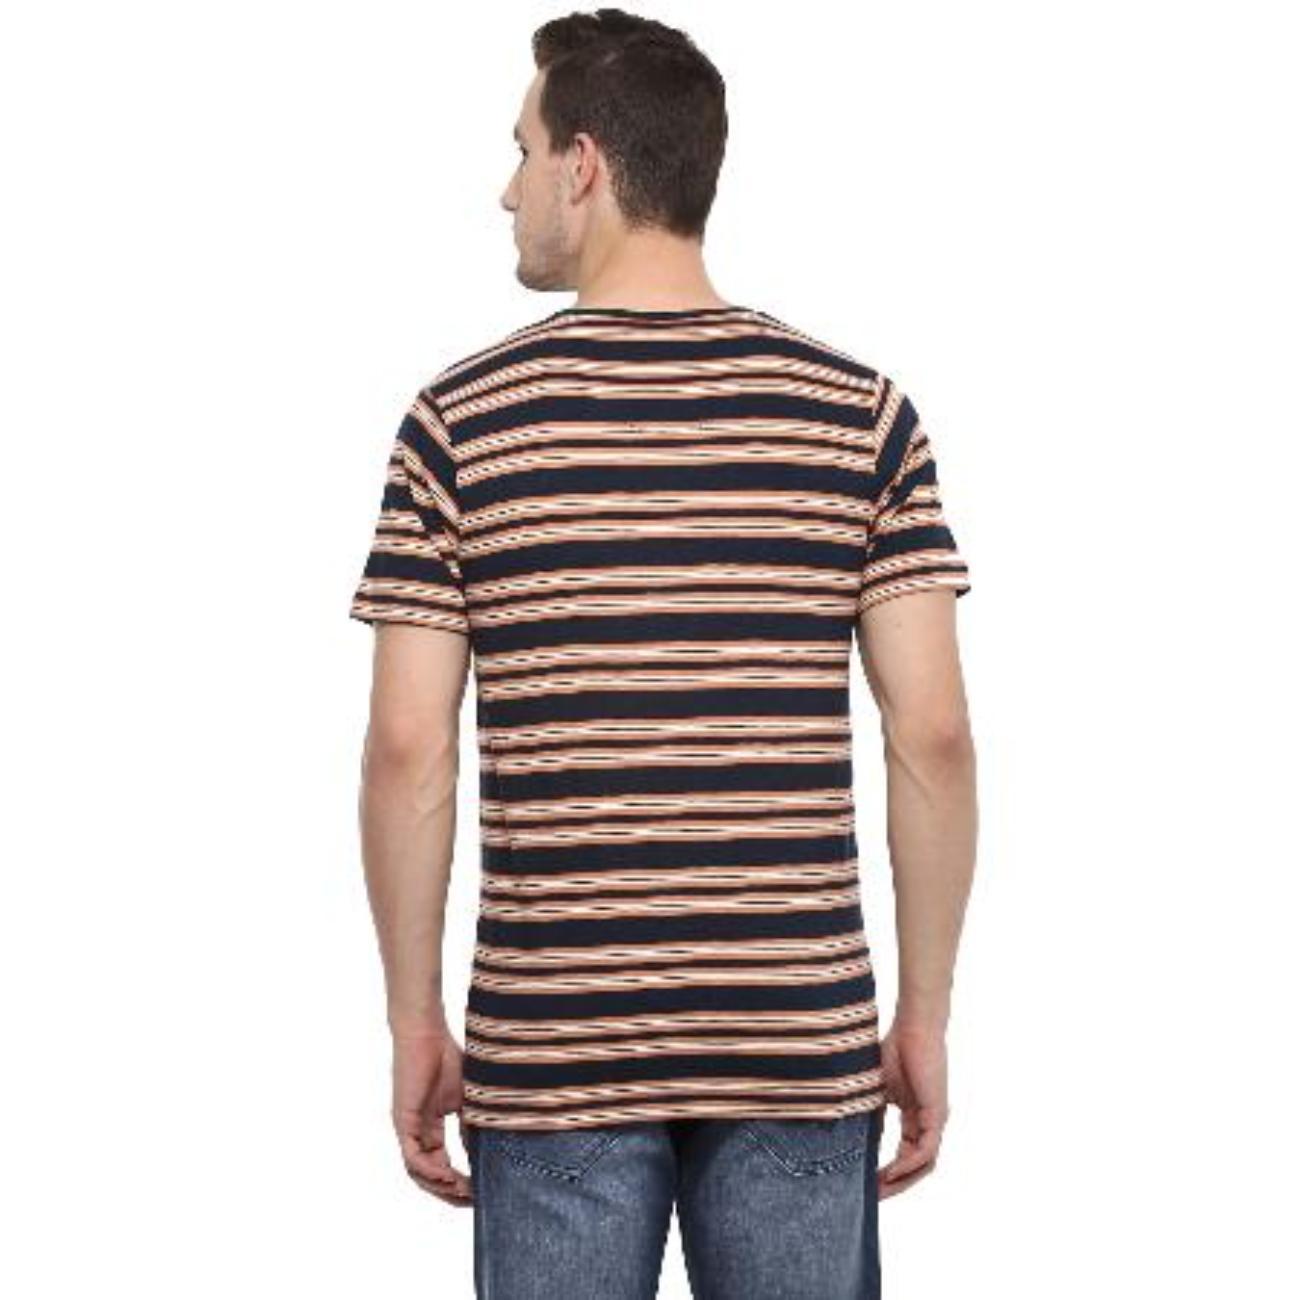 Orange TShirts for Men